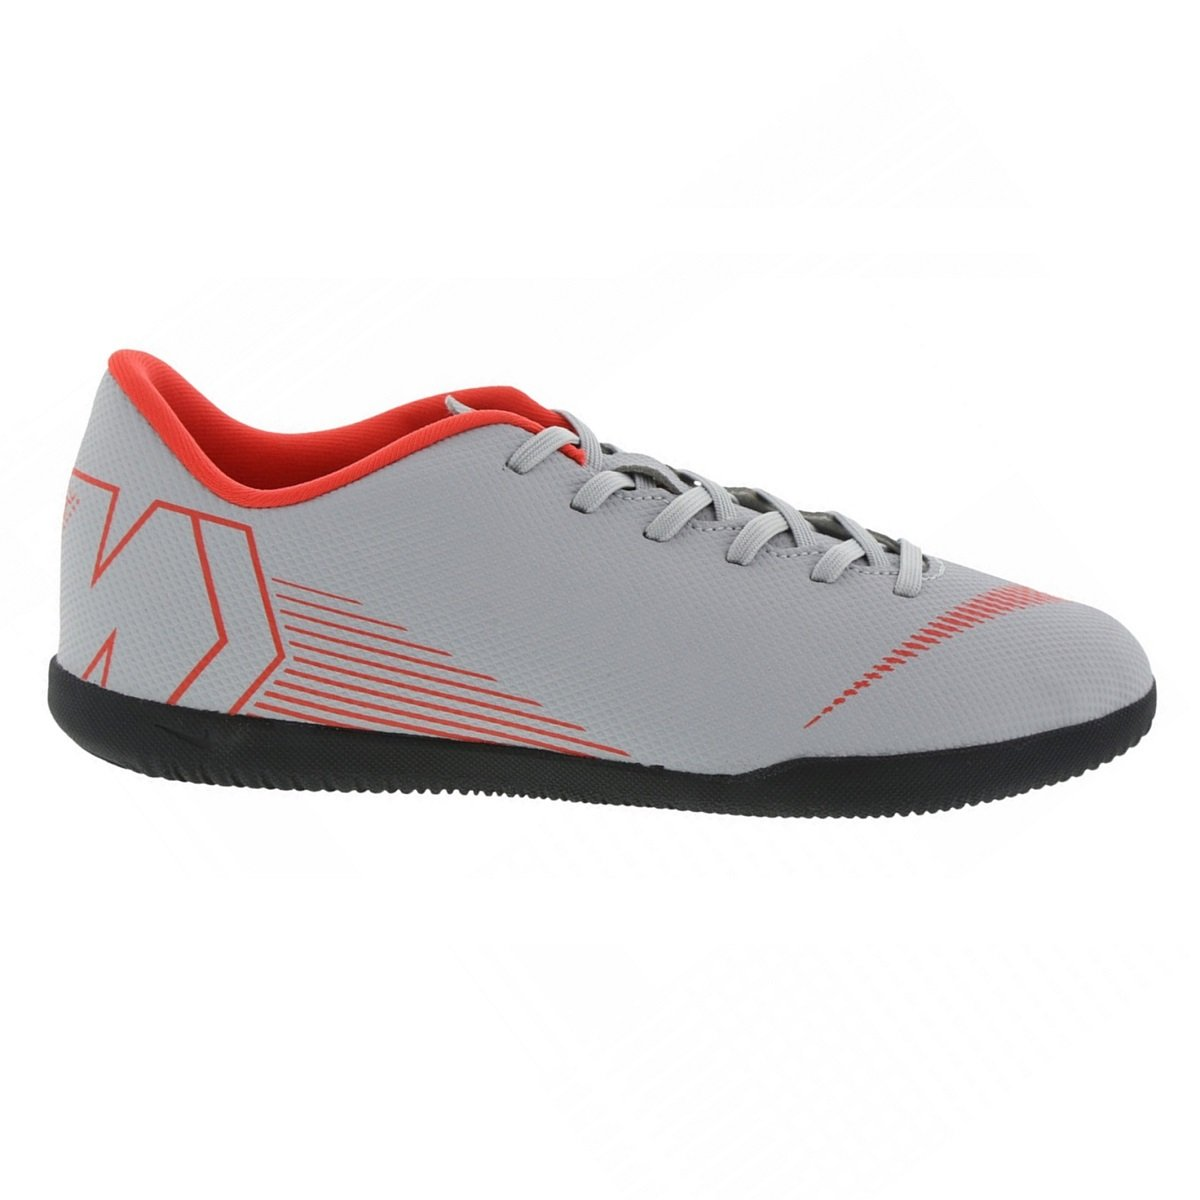 2794dbb020 Indoor Nike Vaporx 12 Club IC AH7385-060 - Cinza Vermelho - Calçados ...